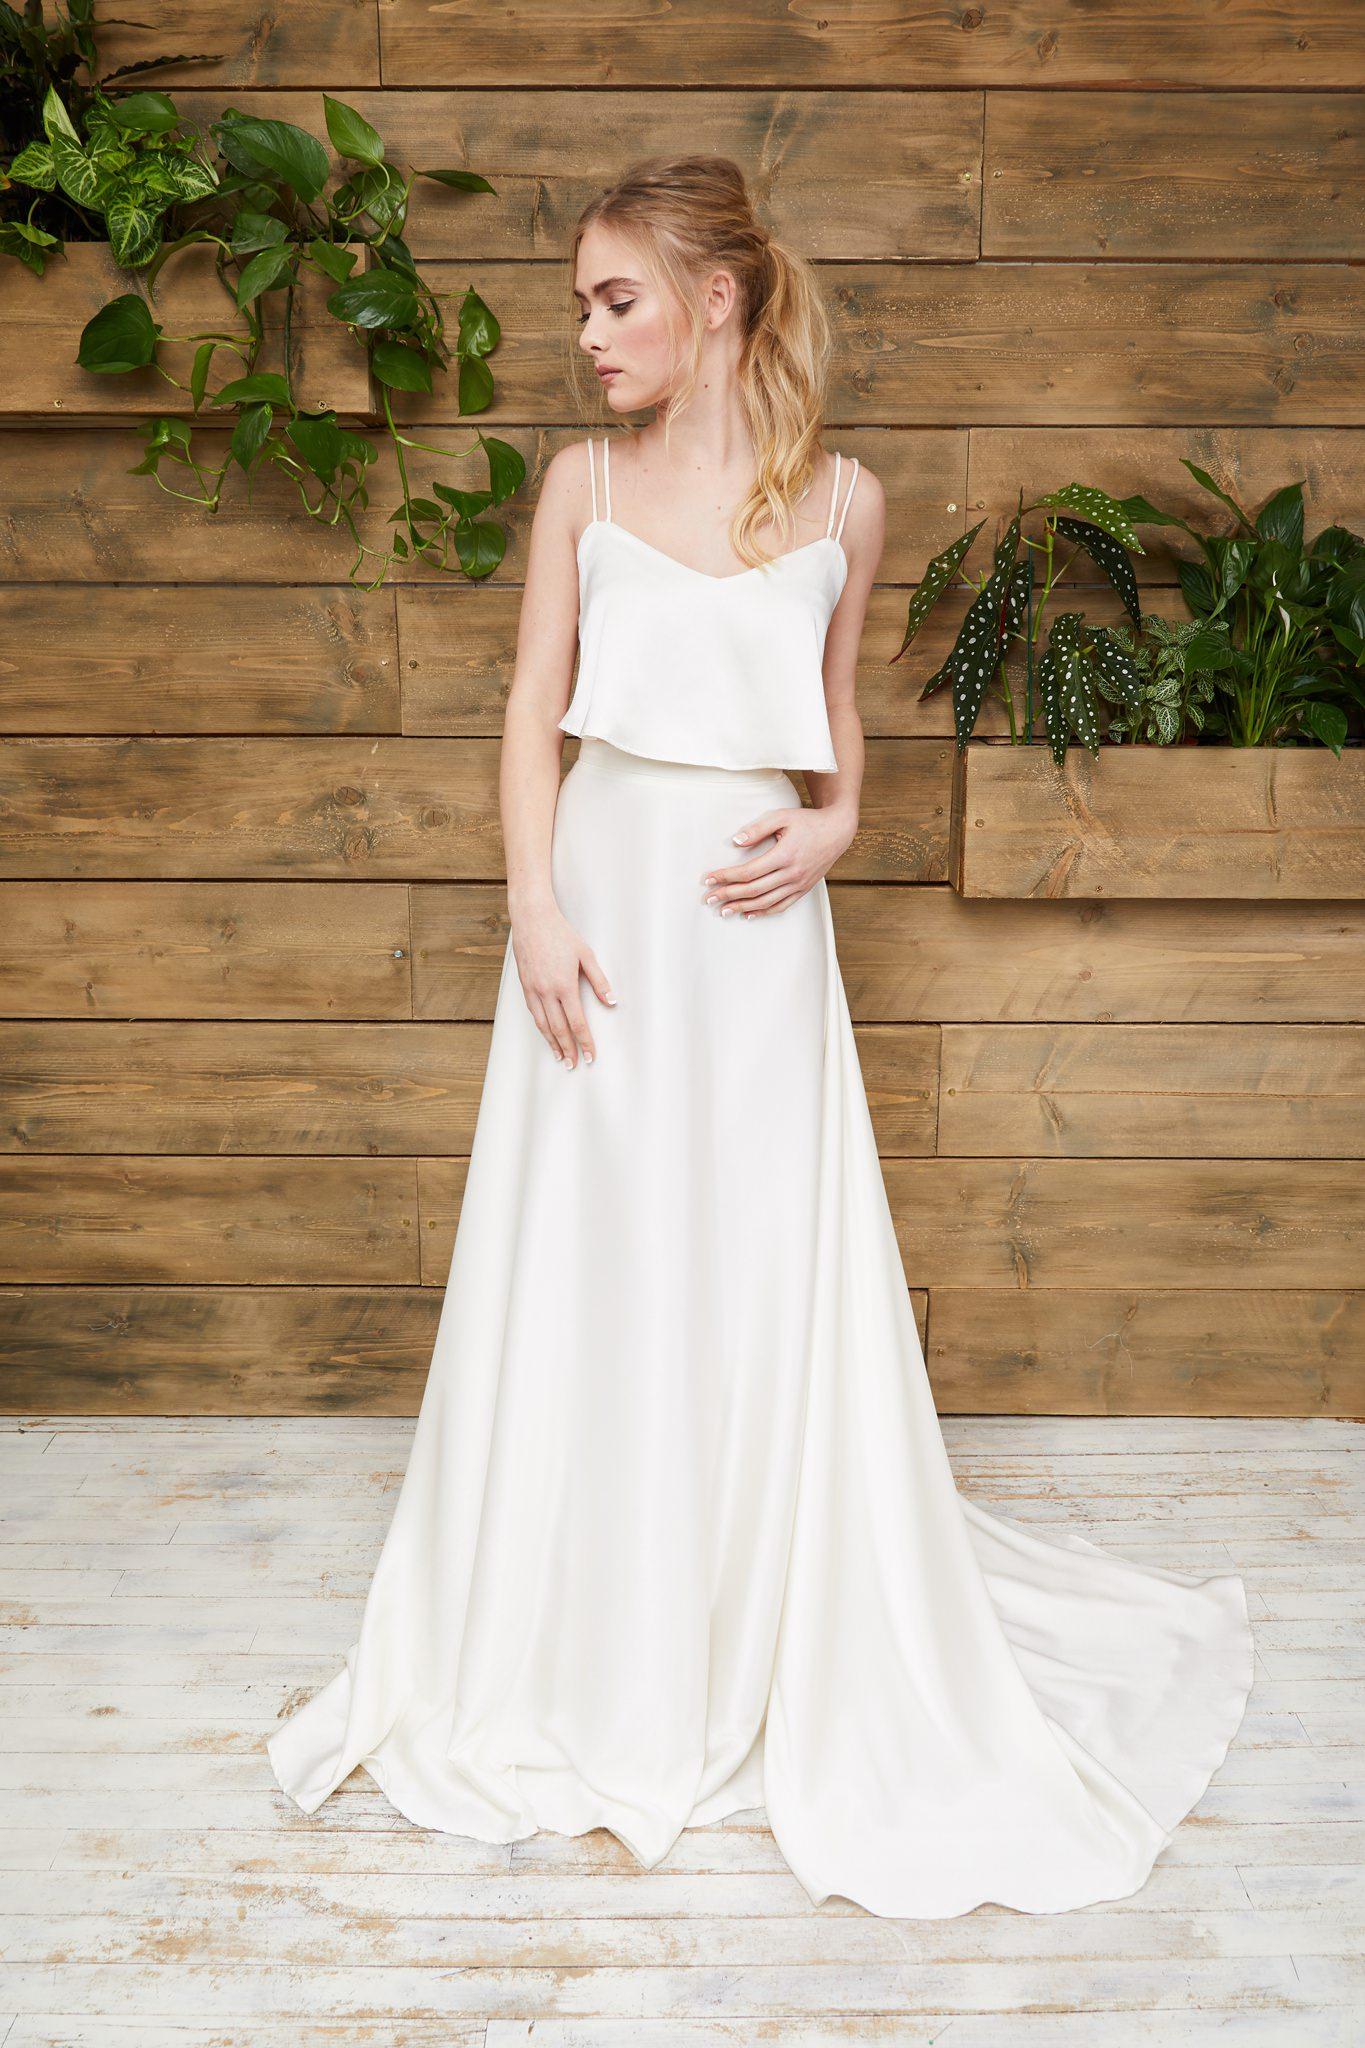 Rachel Burgess Bridal Boutique - Bridal Separates - Handmade Wedding, Boho wedding dress. Celo&Olive Separates.jpg